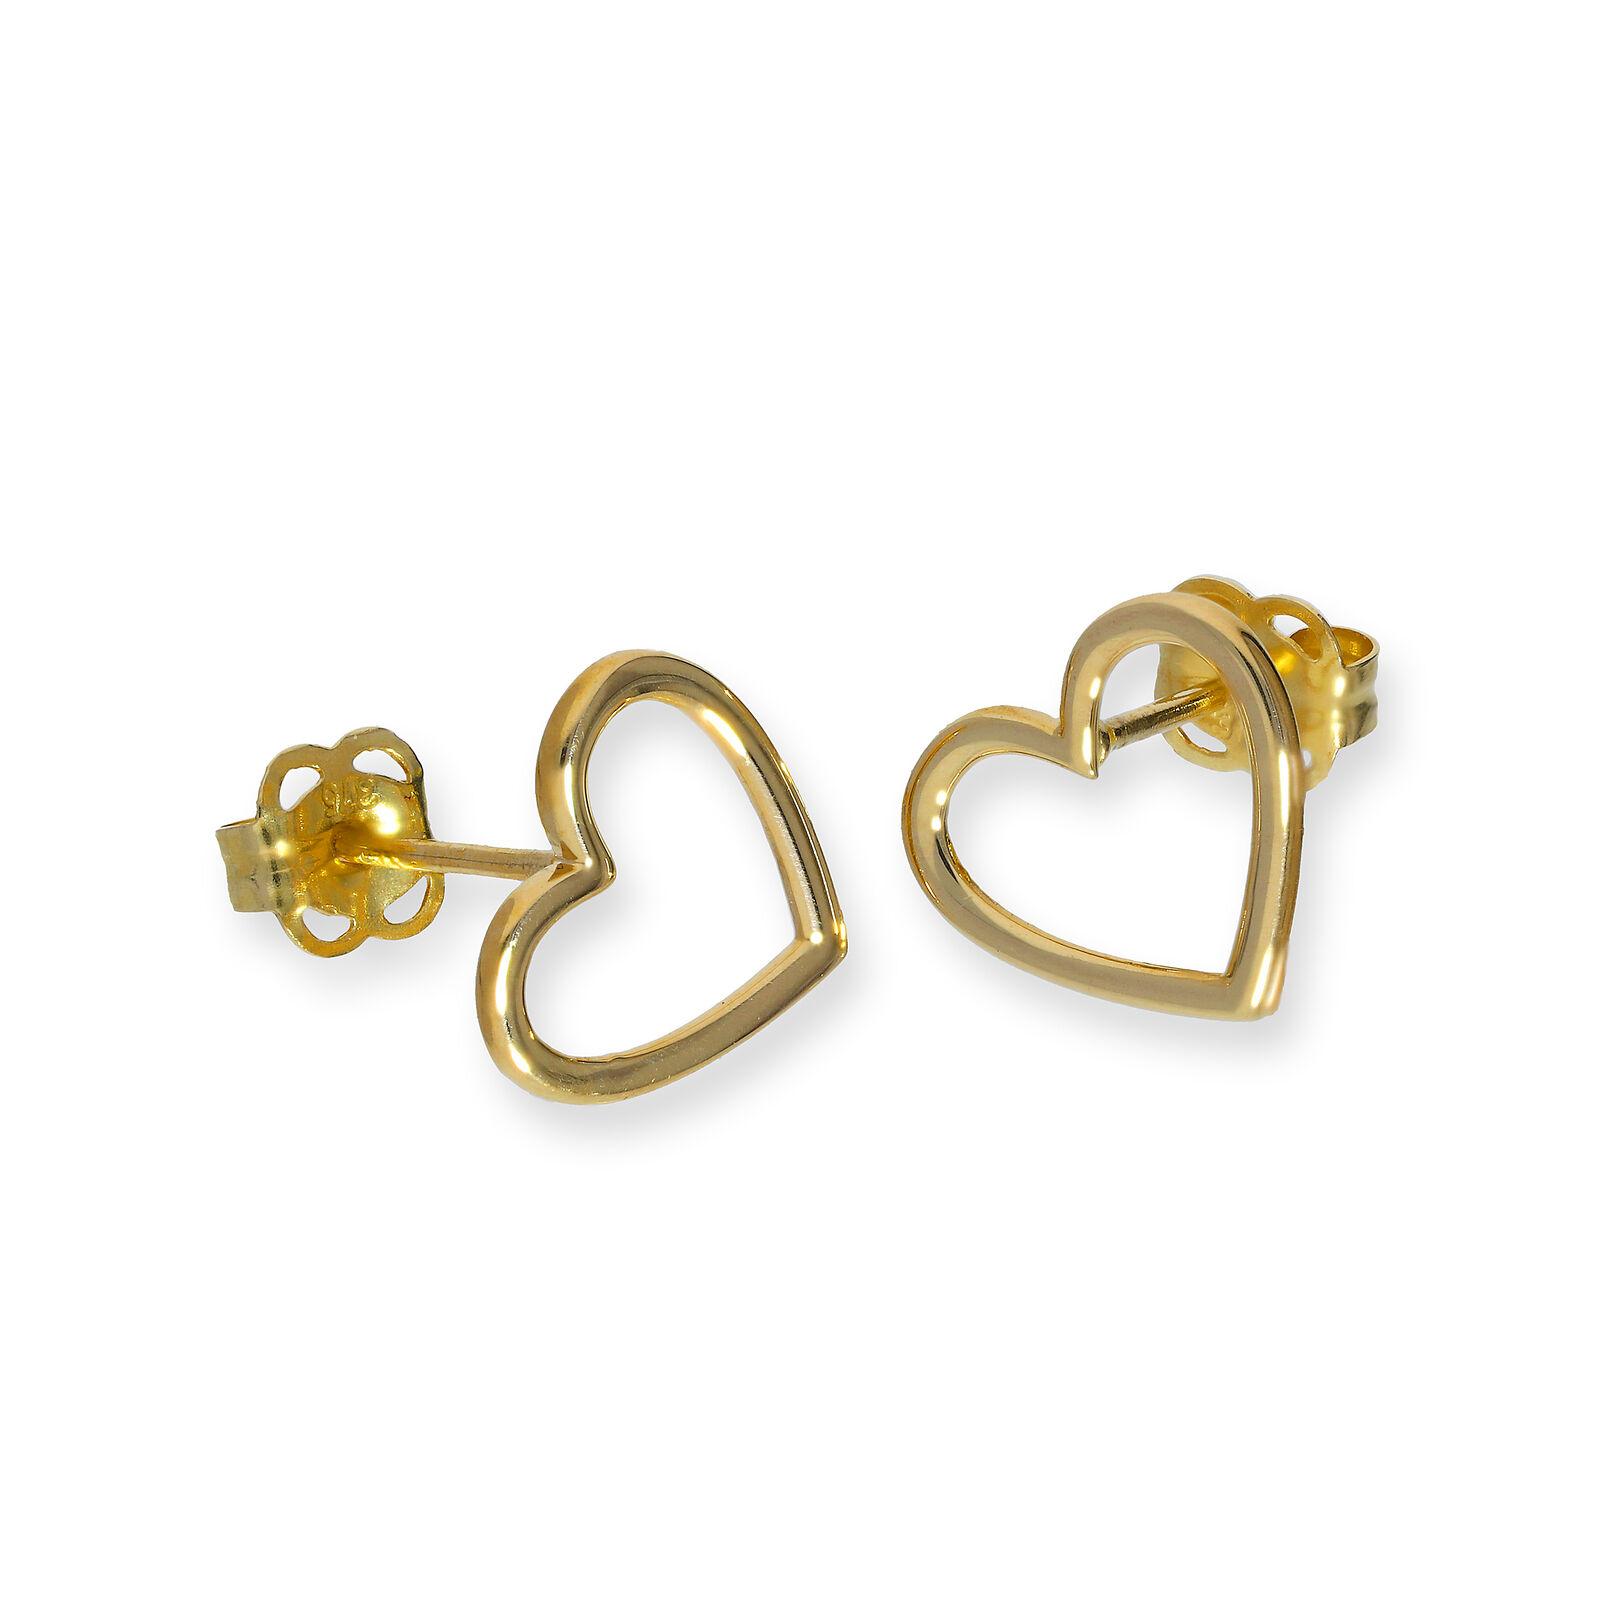 New 9ct GOLD HEART STUD EARRINGS